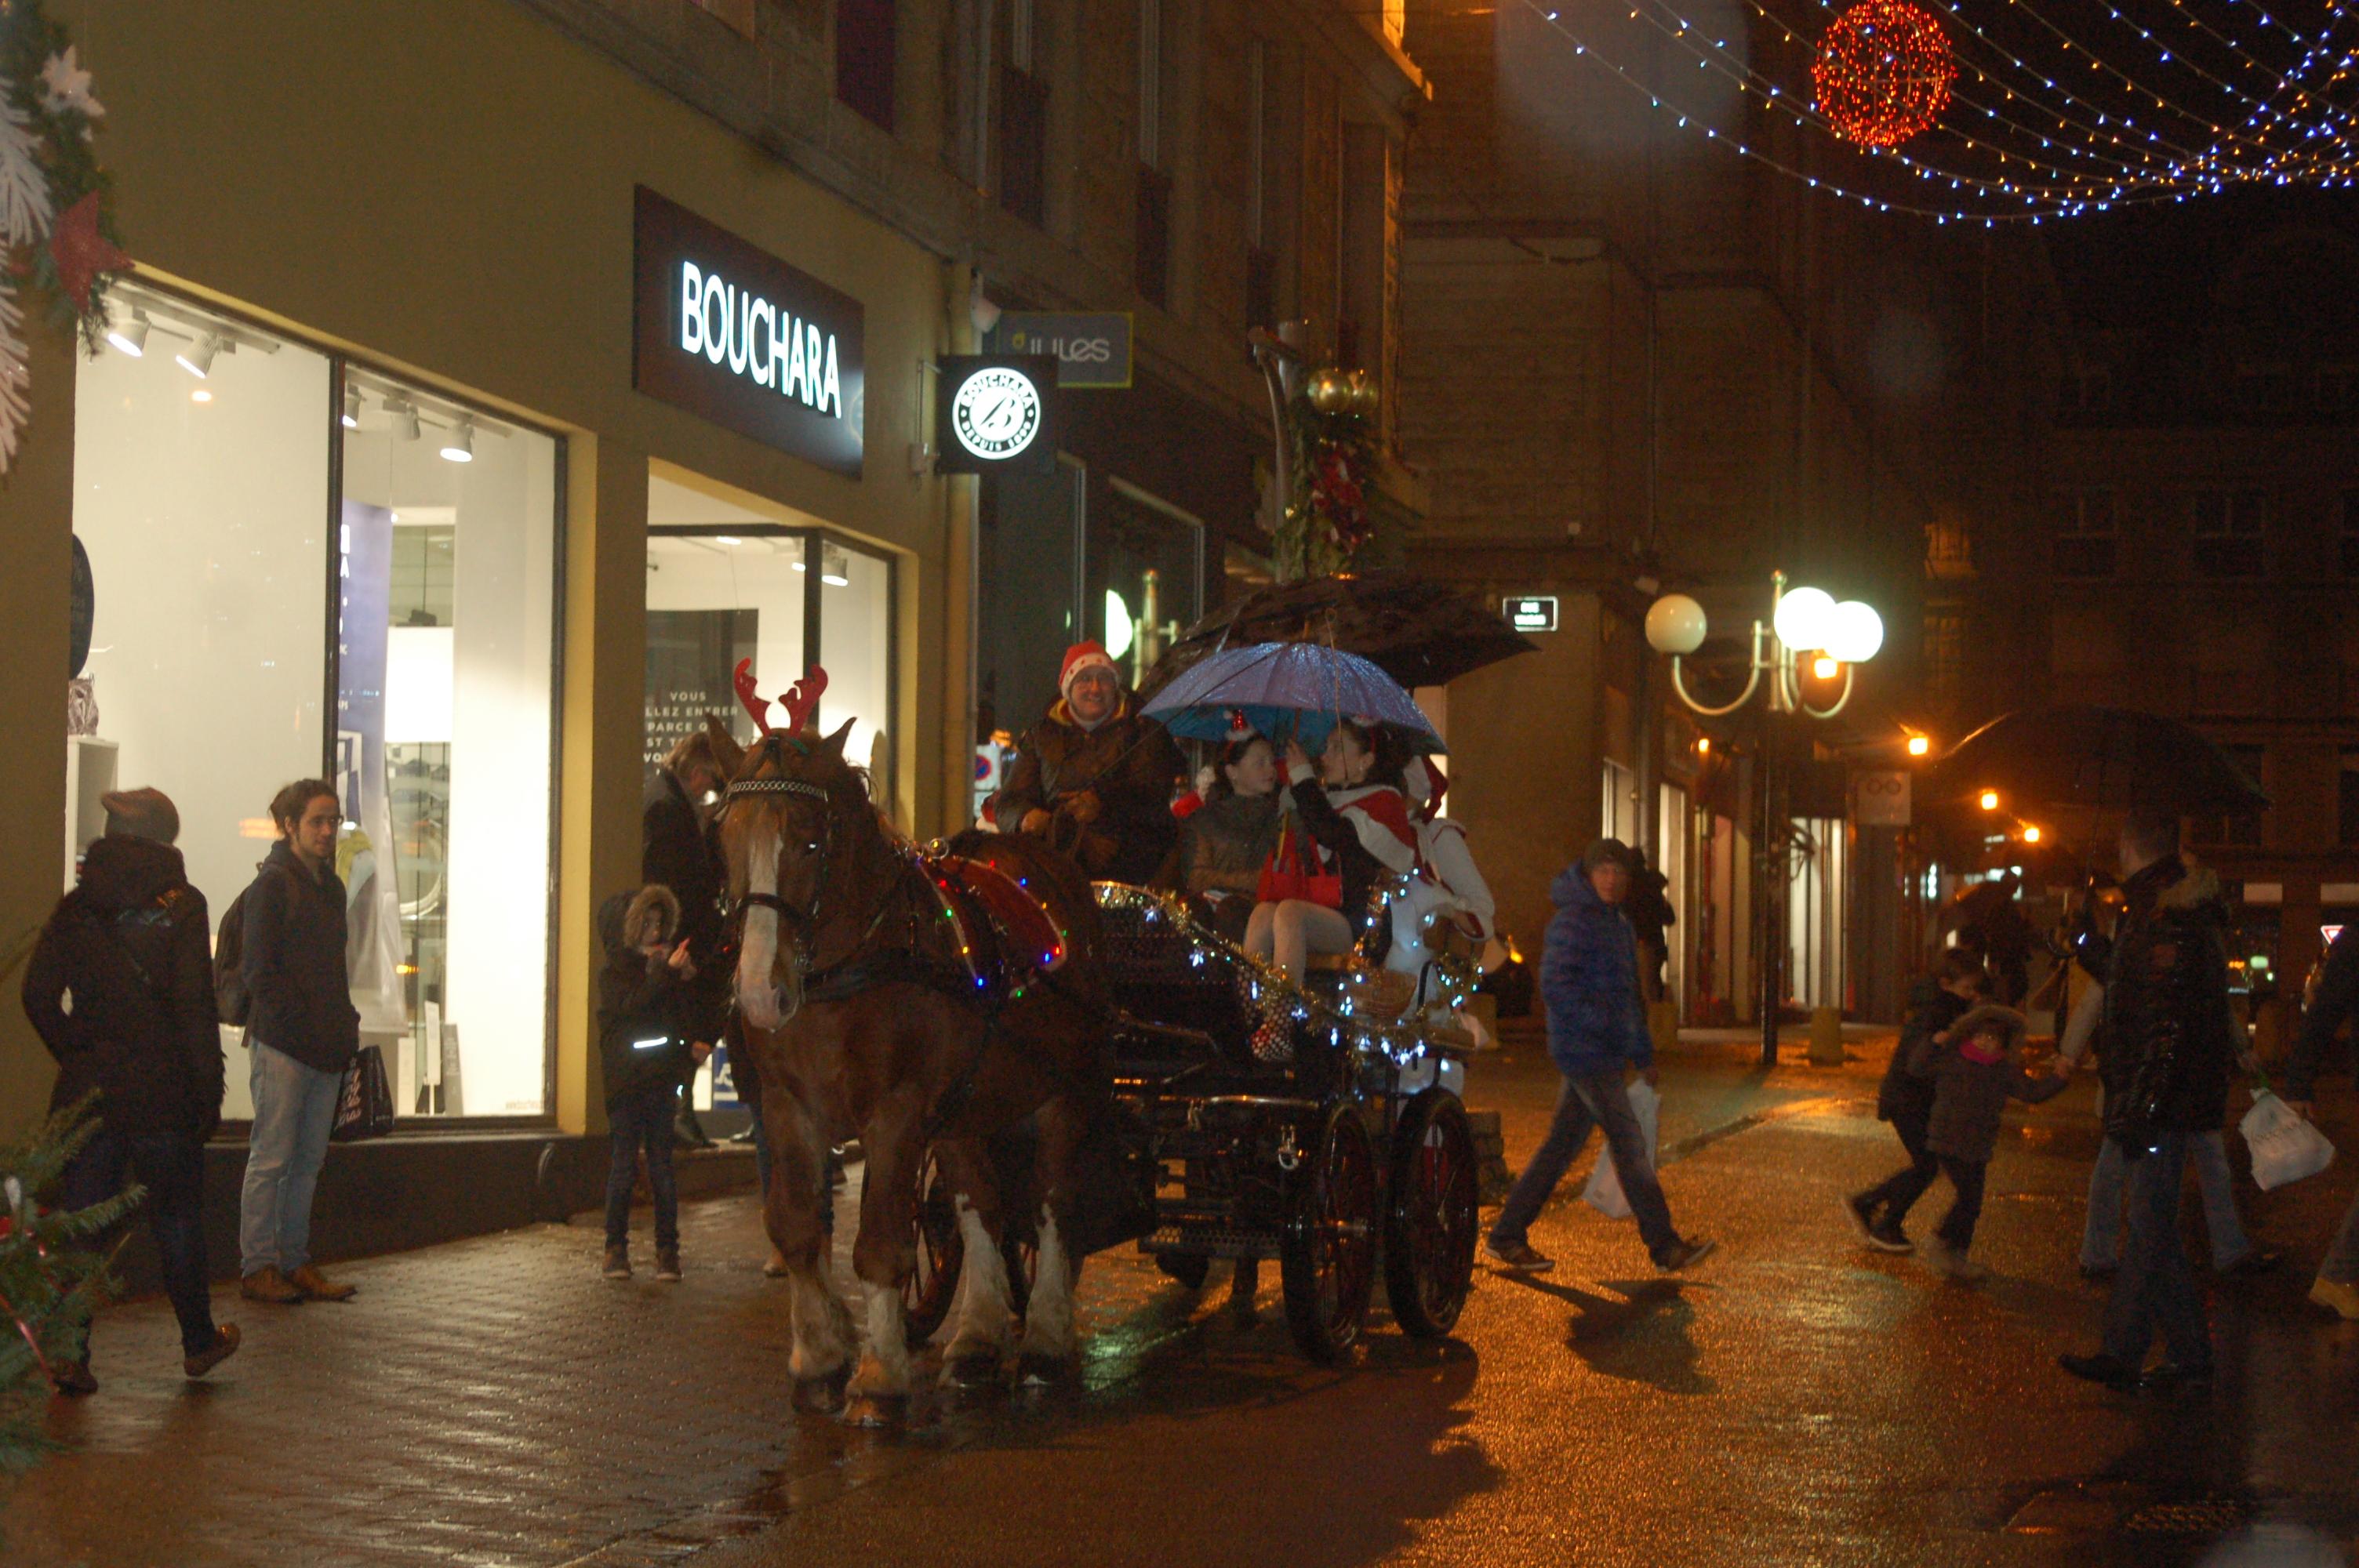 noel 2018 lorient Père Noel à Lorient   Attelage AR MANER noel 2018 lorient